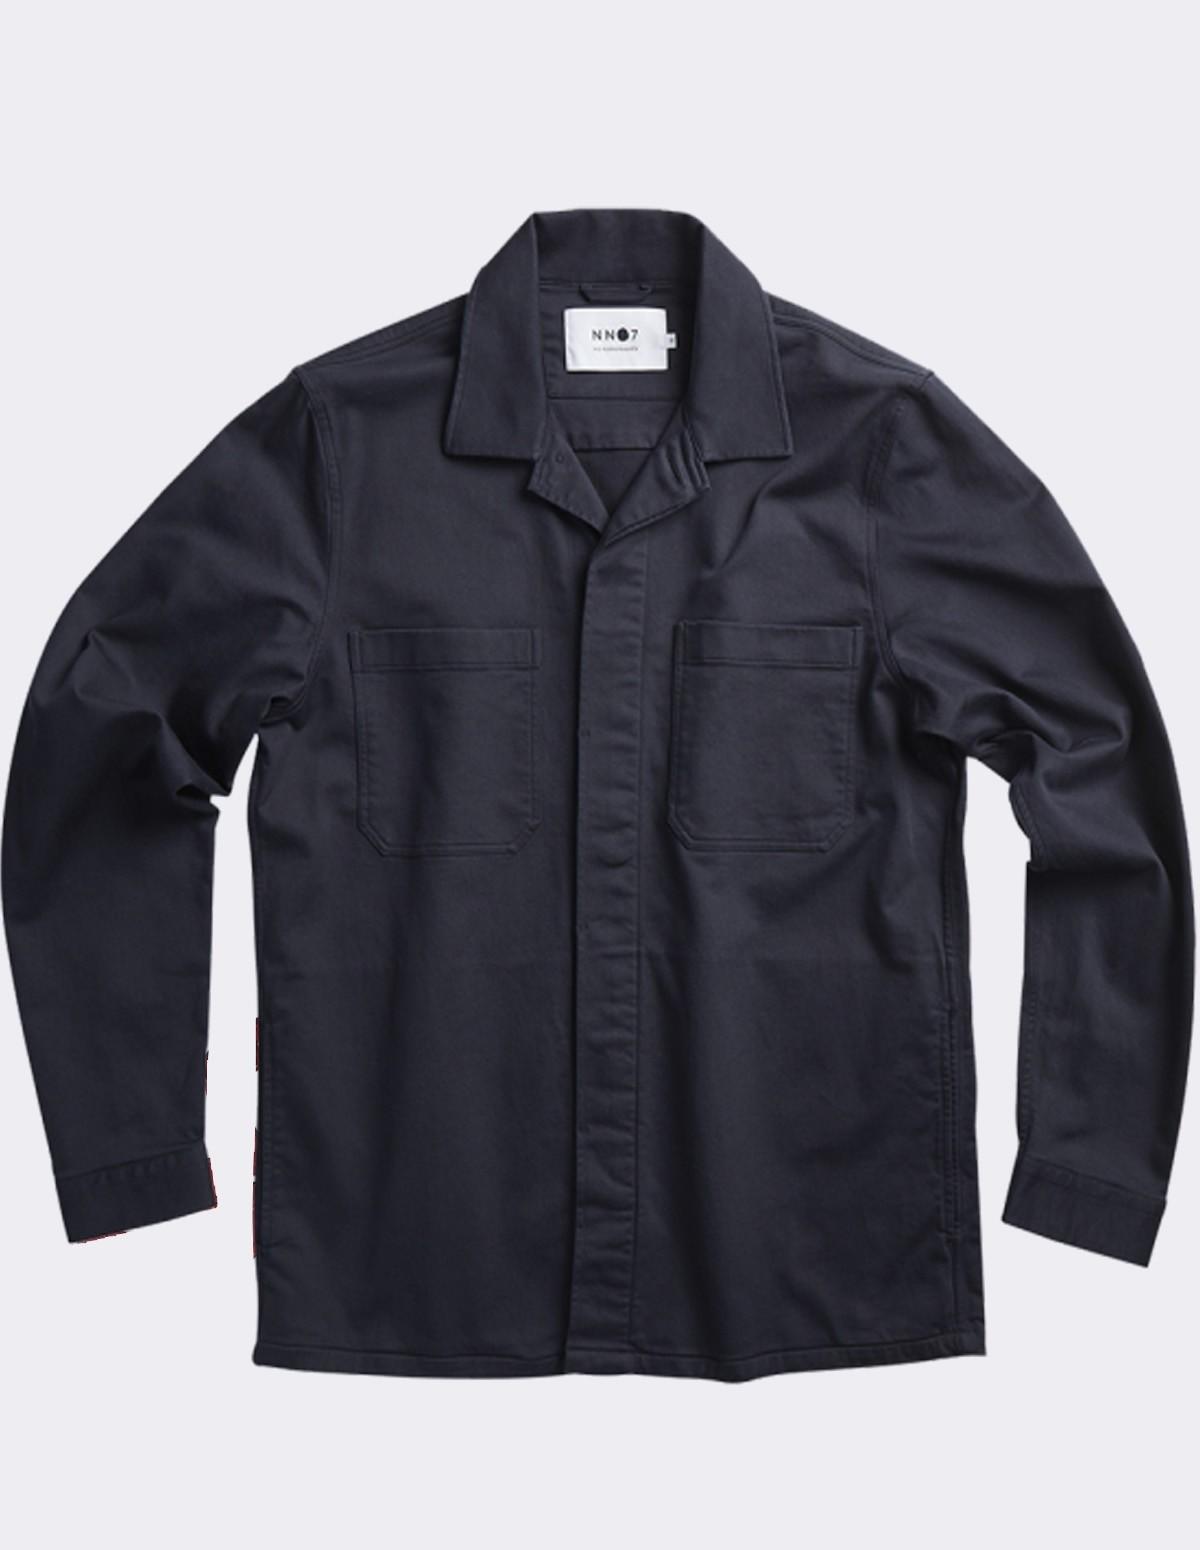 Nn07 Bernie 1420 Jacket - NAVY 200